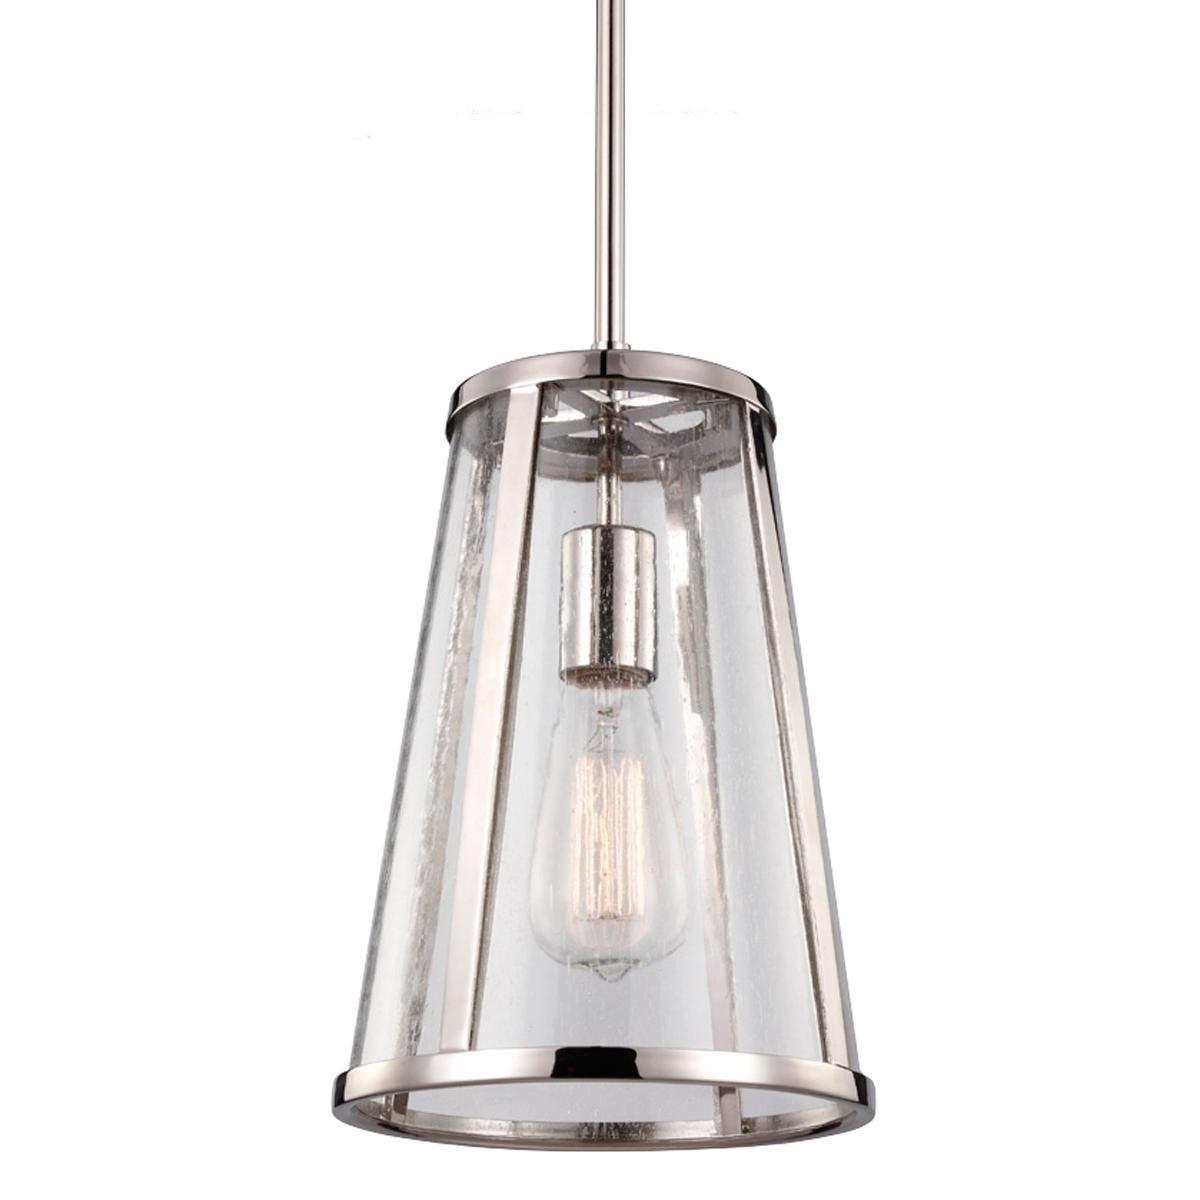 Seeded glass transitional mini pendant light mini pendant lights seeded glass transitional mini pendant light aloadofball Image collections